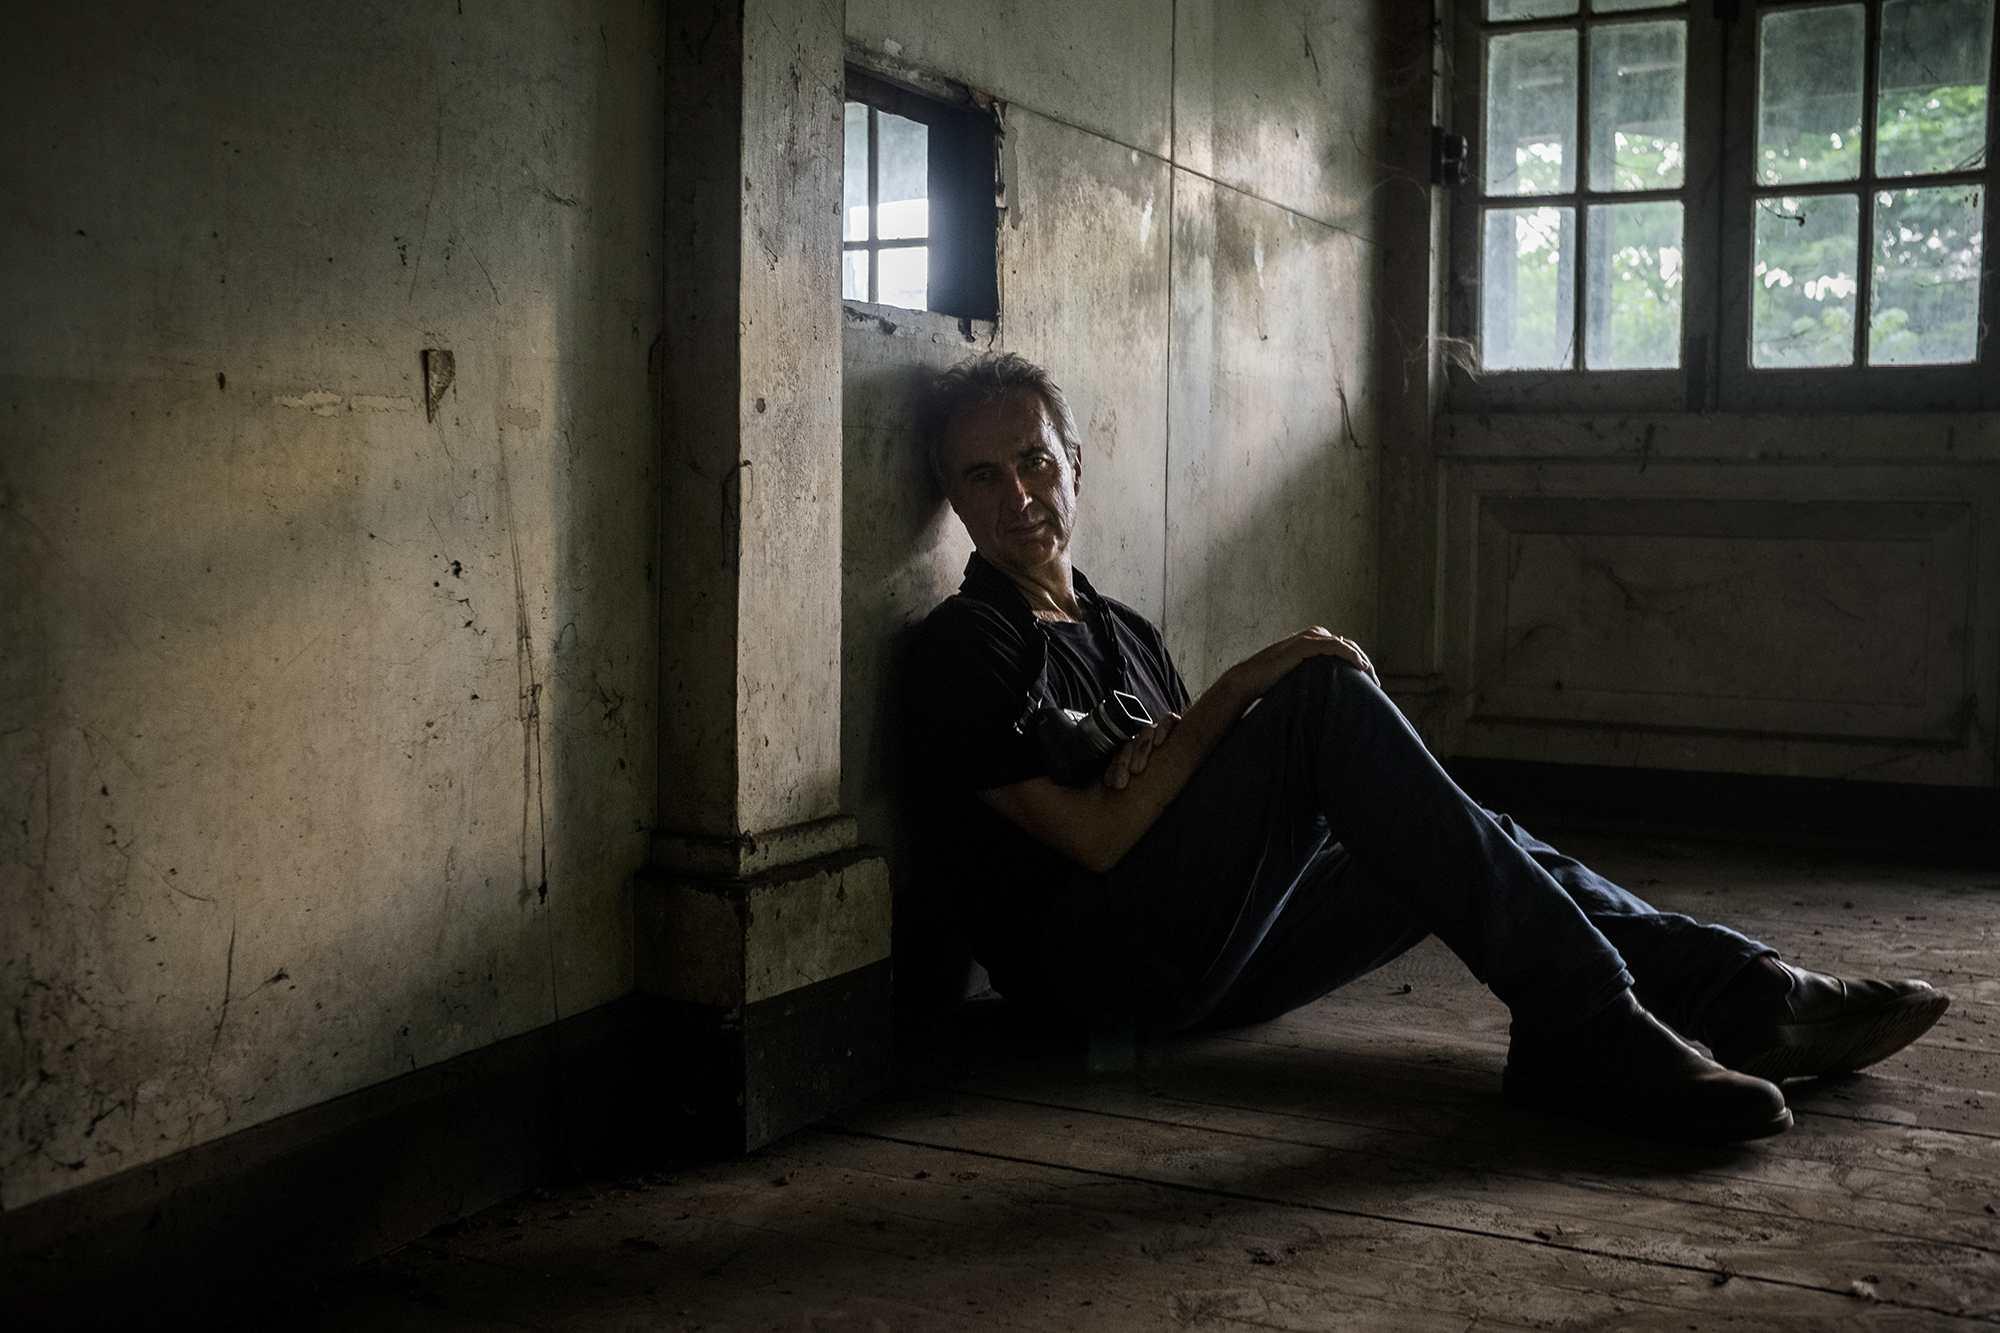 Jack Picone. Rangoon, Burma. 2013